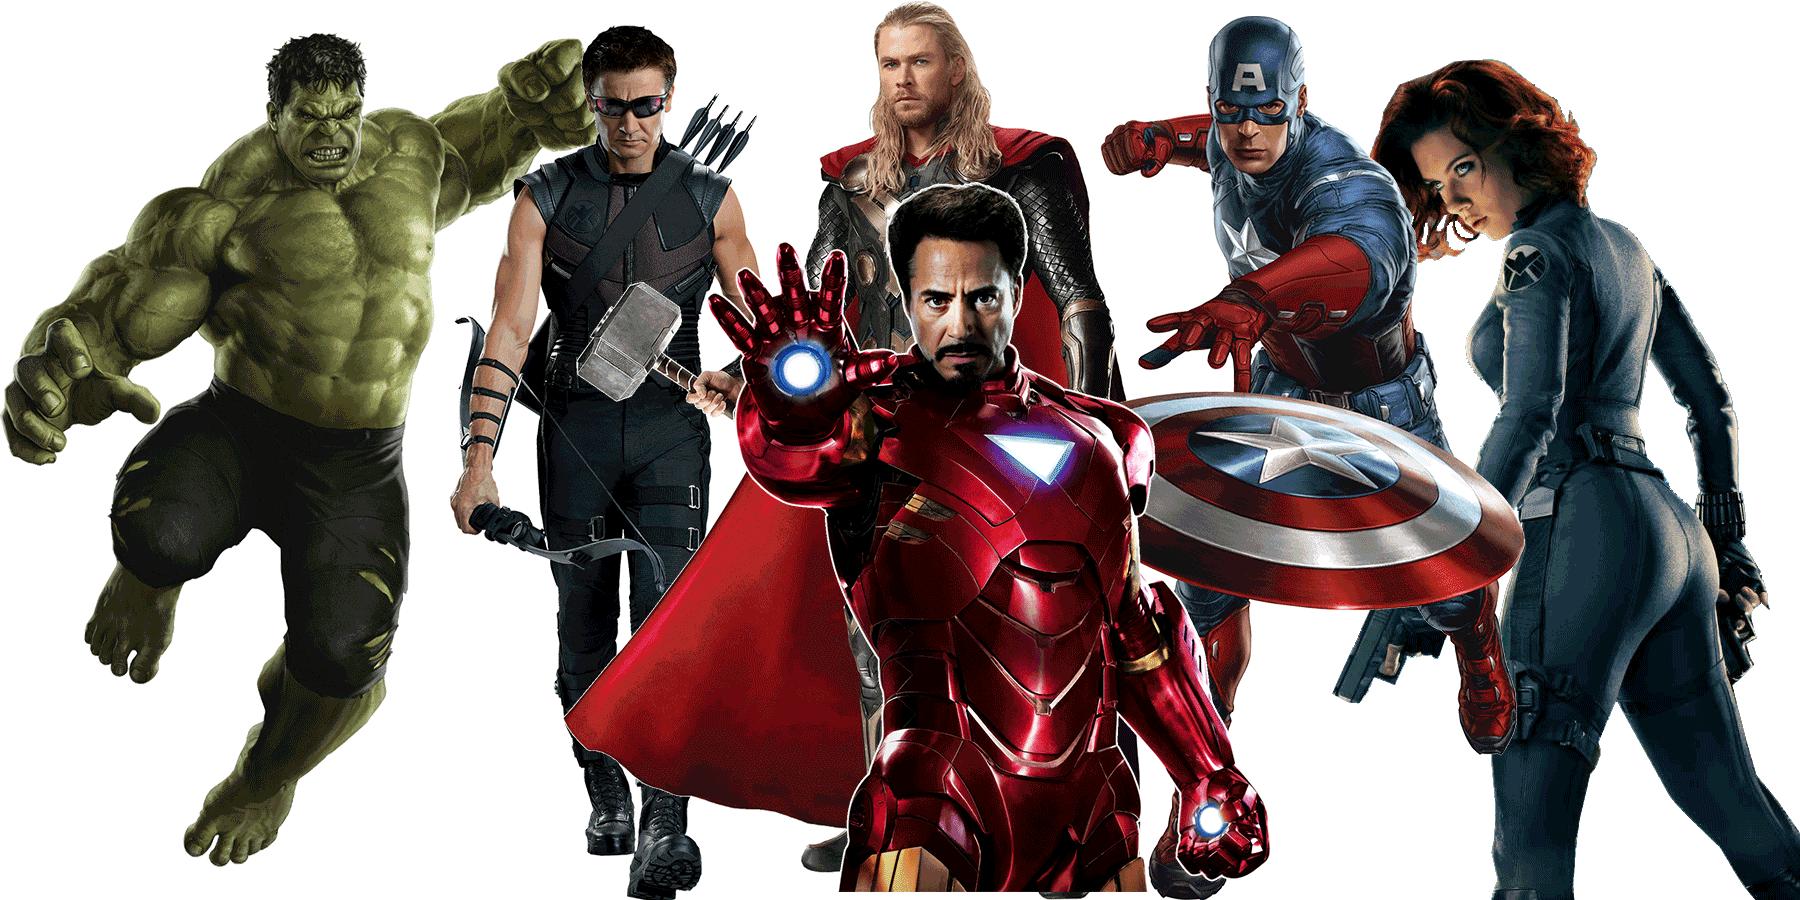 Avengers clipart avengers movie. Hd png transparent images